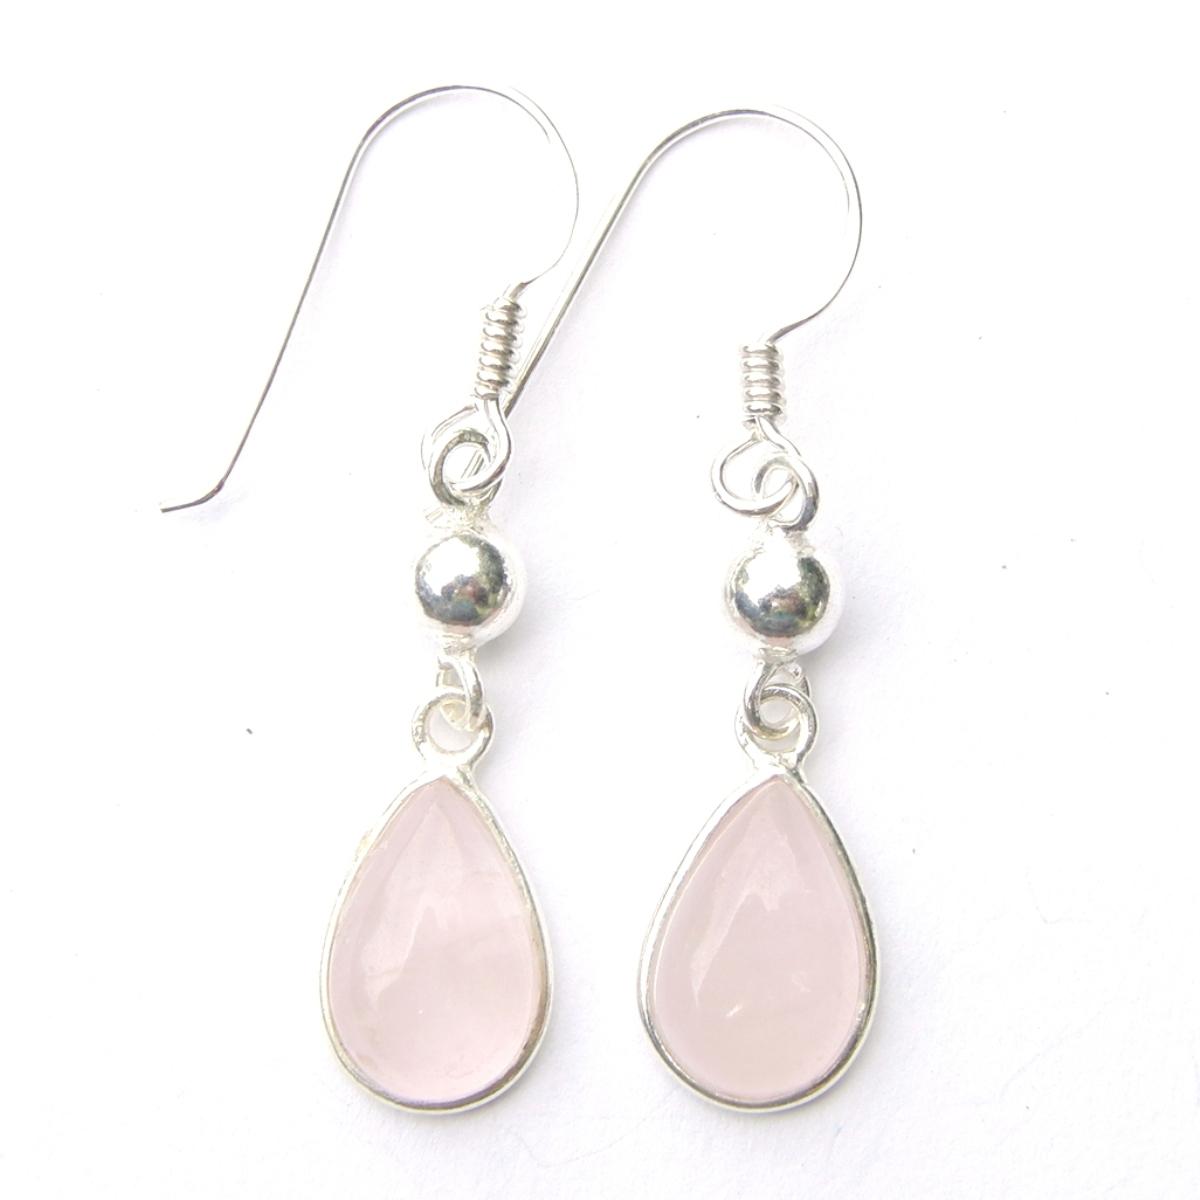 Rose Quartz Dangling Earrings